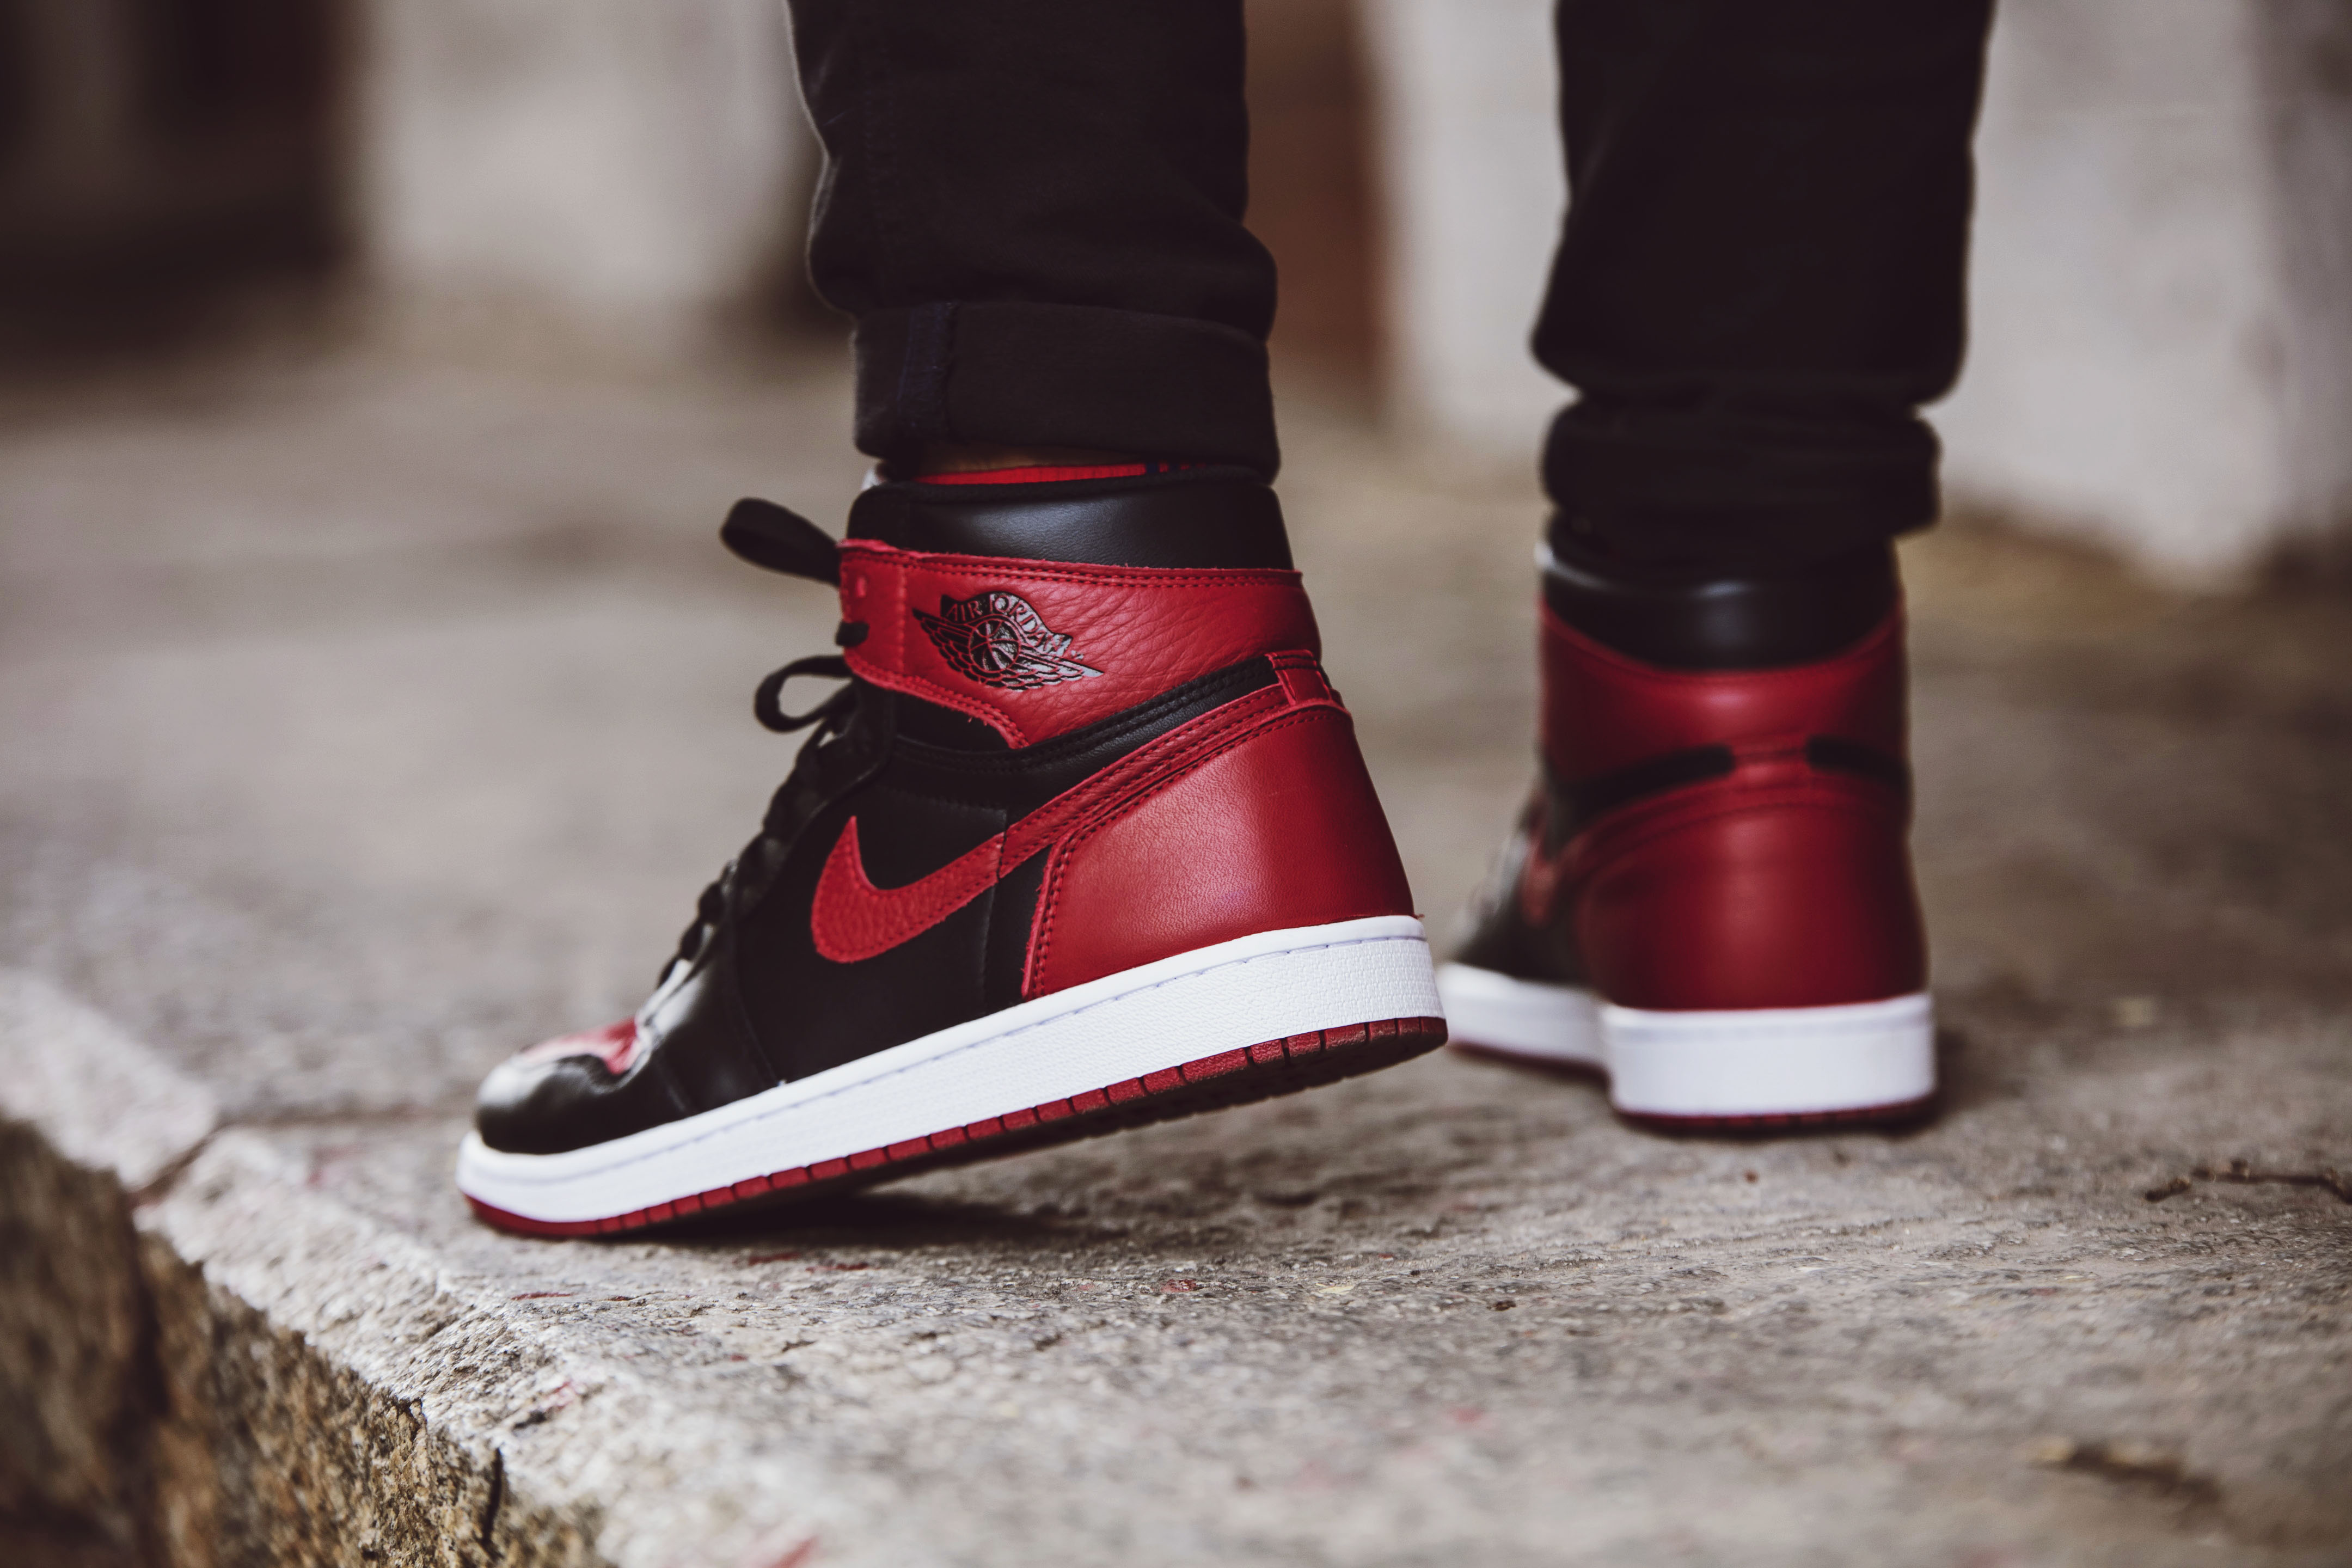 super popular 69718 7643a Nike Air Jordan 1 Bred – Up Close and Review | bowties and bones